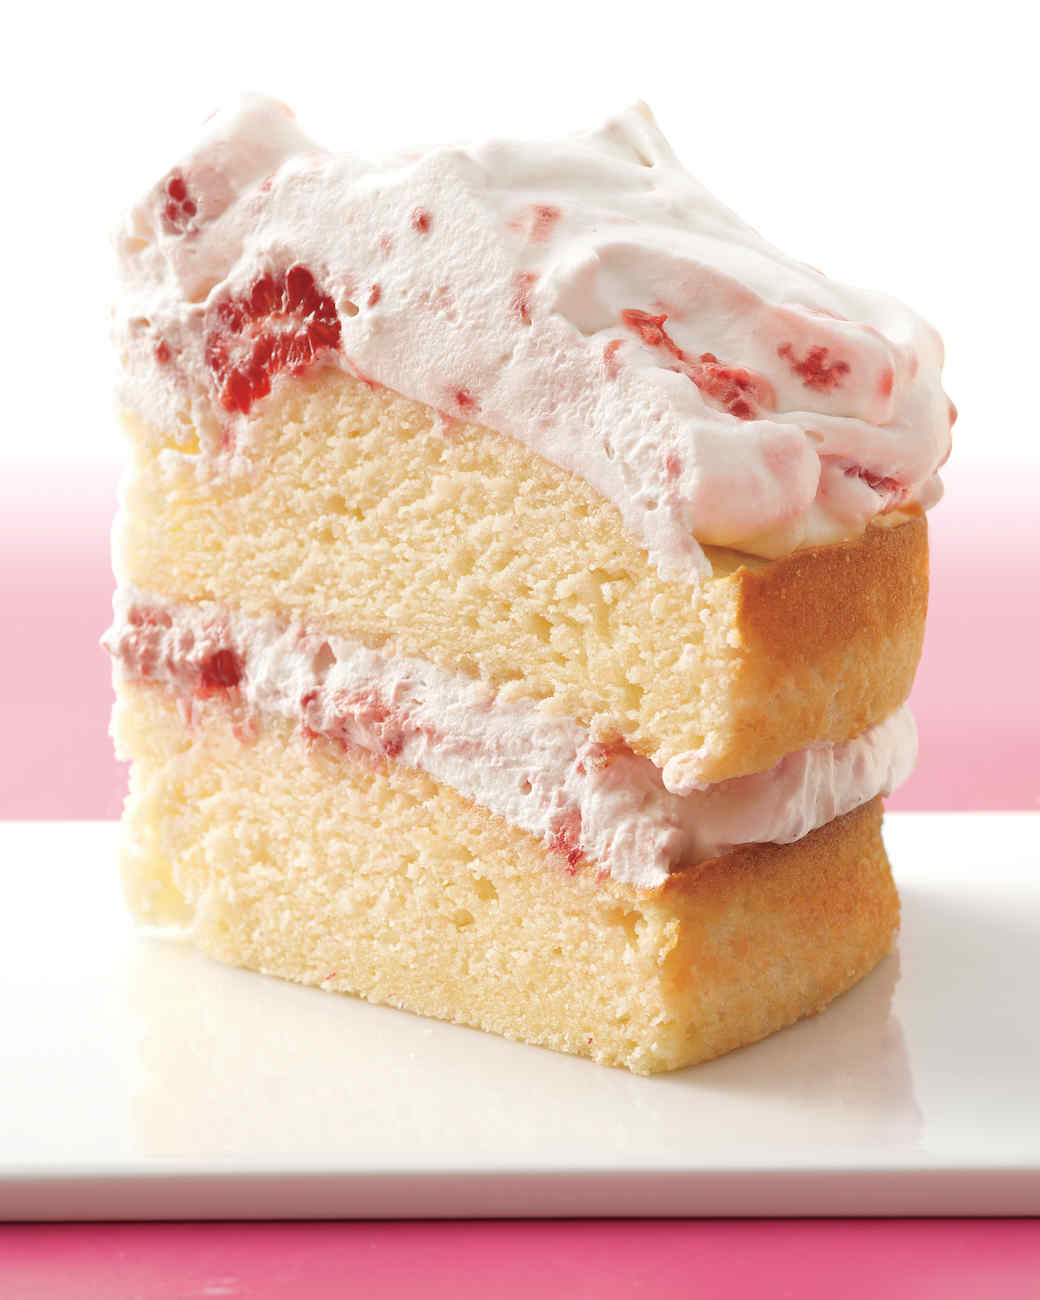 Raspberry-Cream Layer Cake